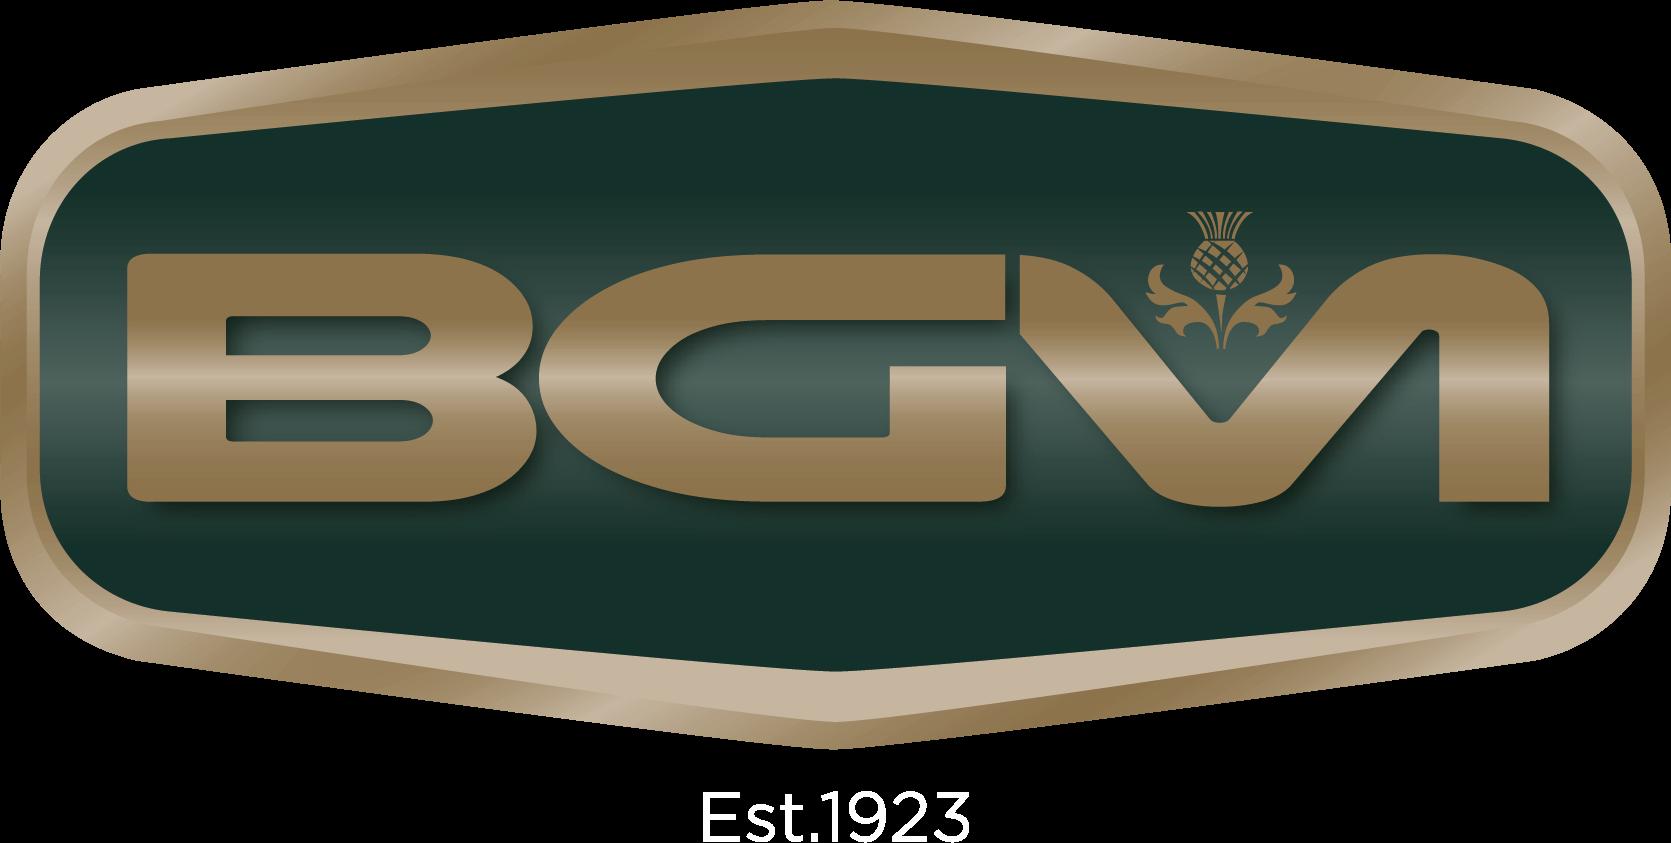 Ben Greig Motors Limited